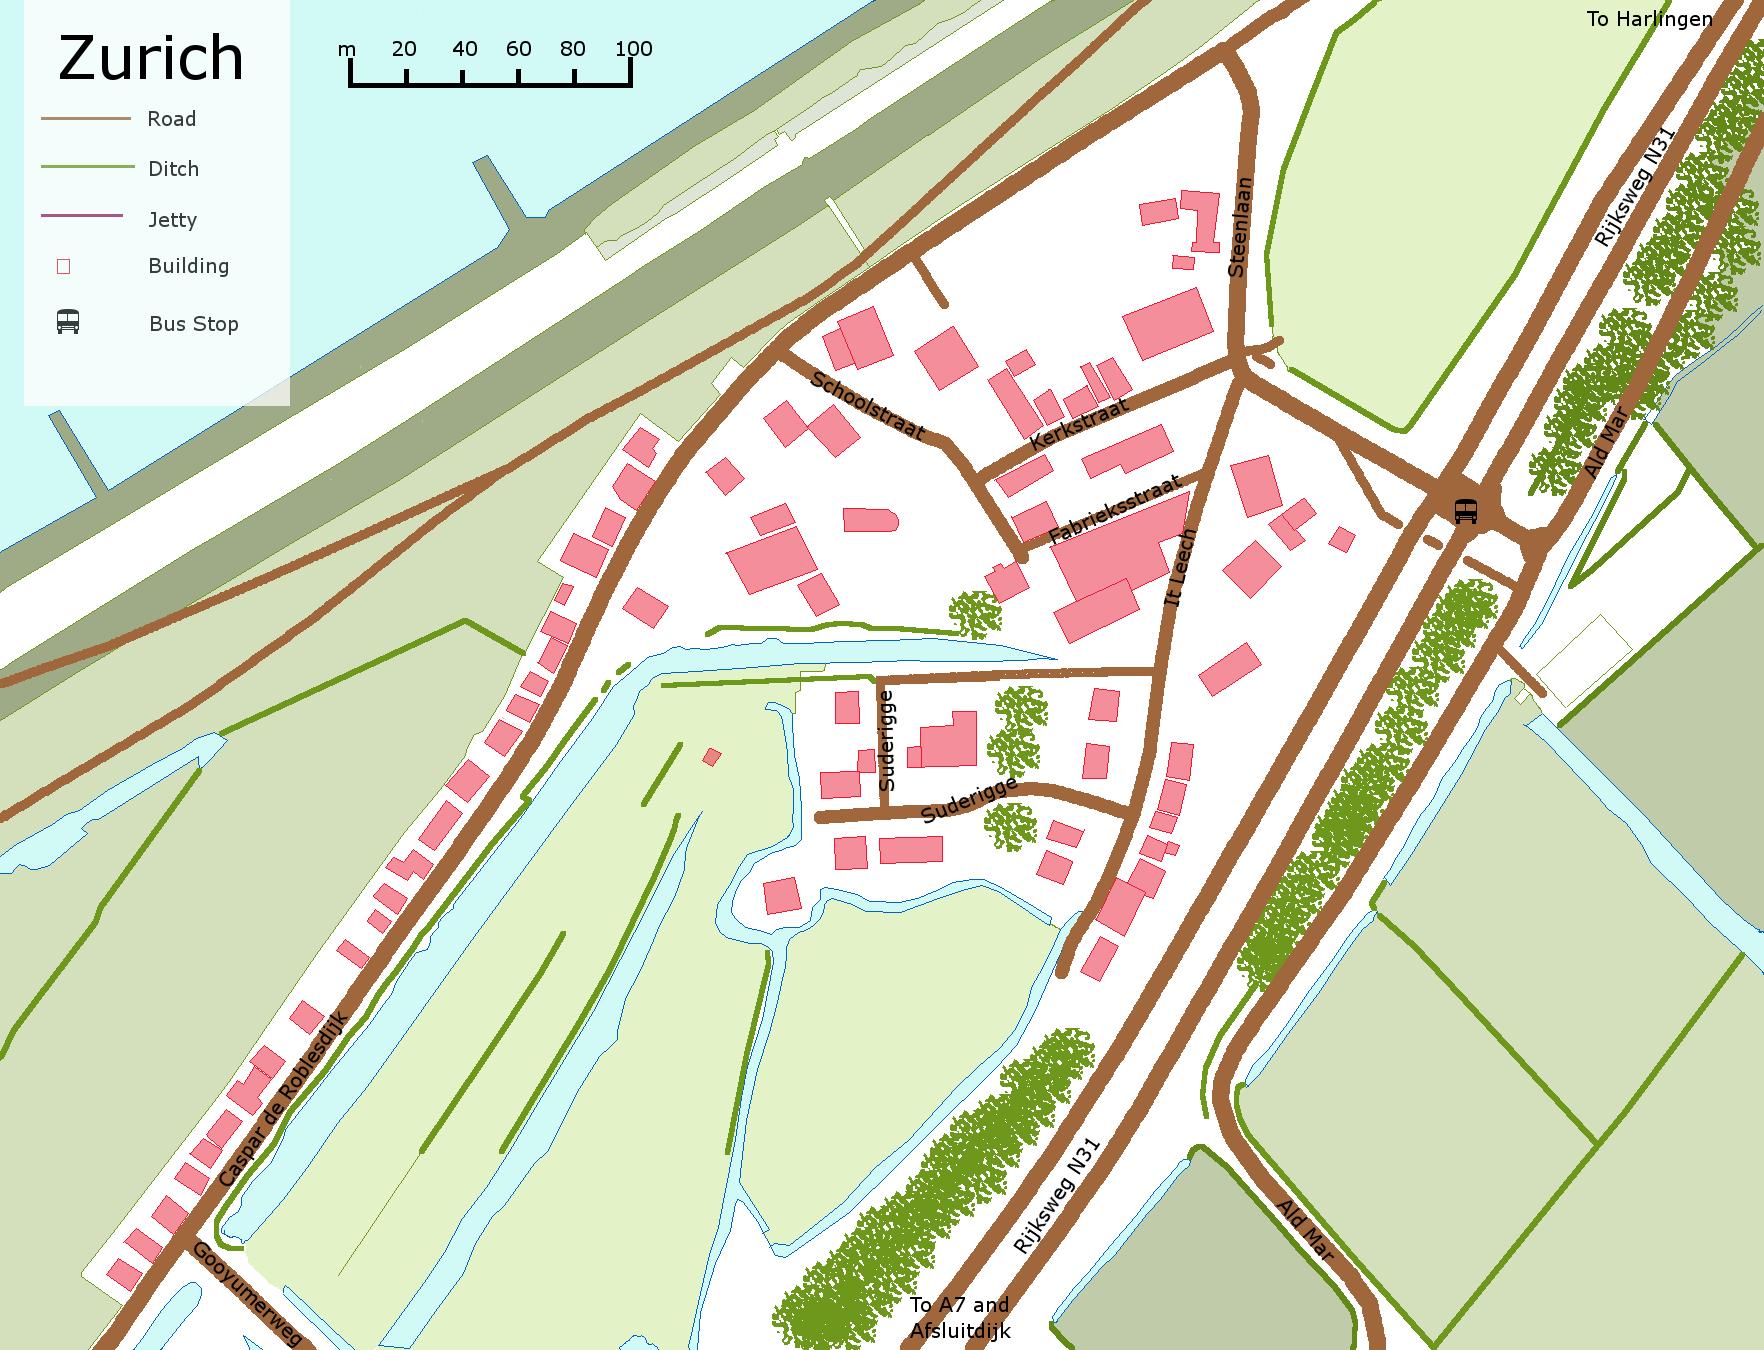 Datei:Zurich Friesland map.png – Wikipedia on